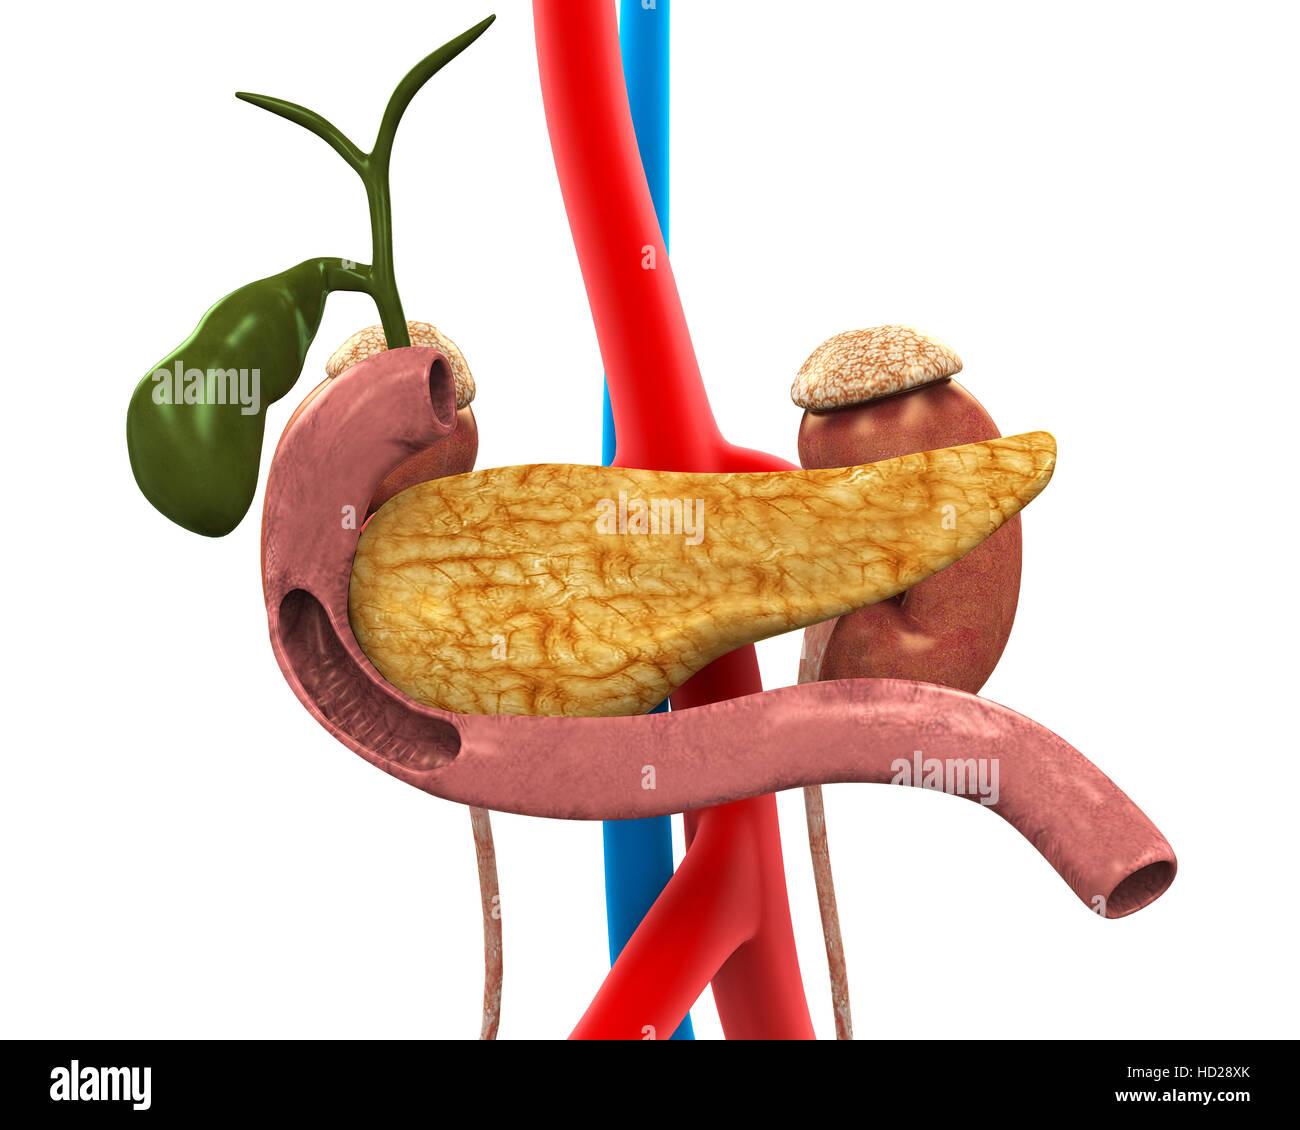 Gallbladder Disease Stock Photos & Gallbladder Disease Stock Images ...